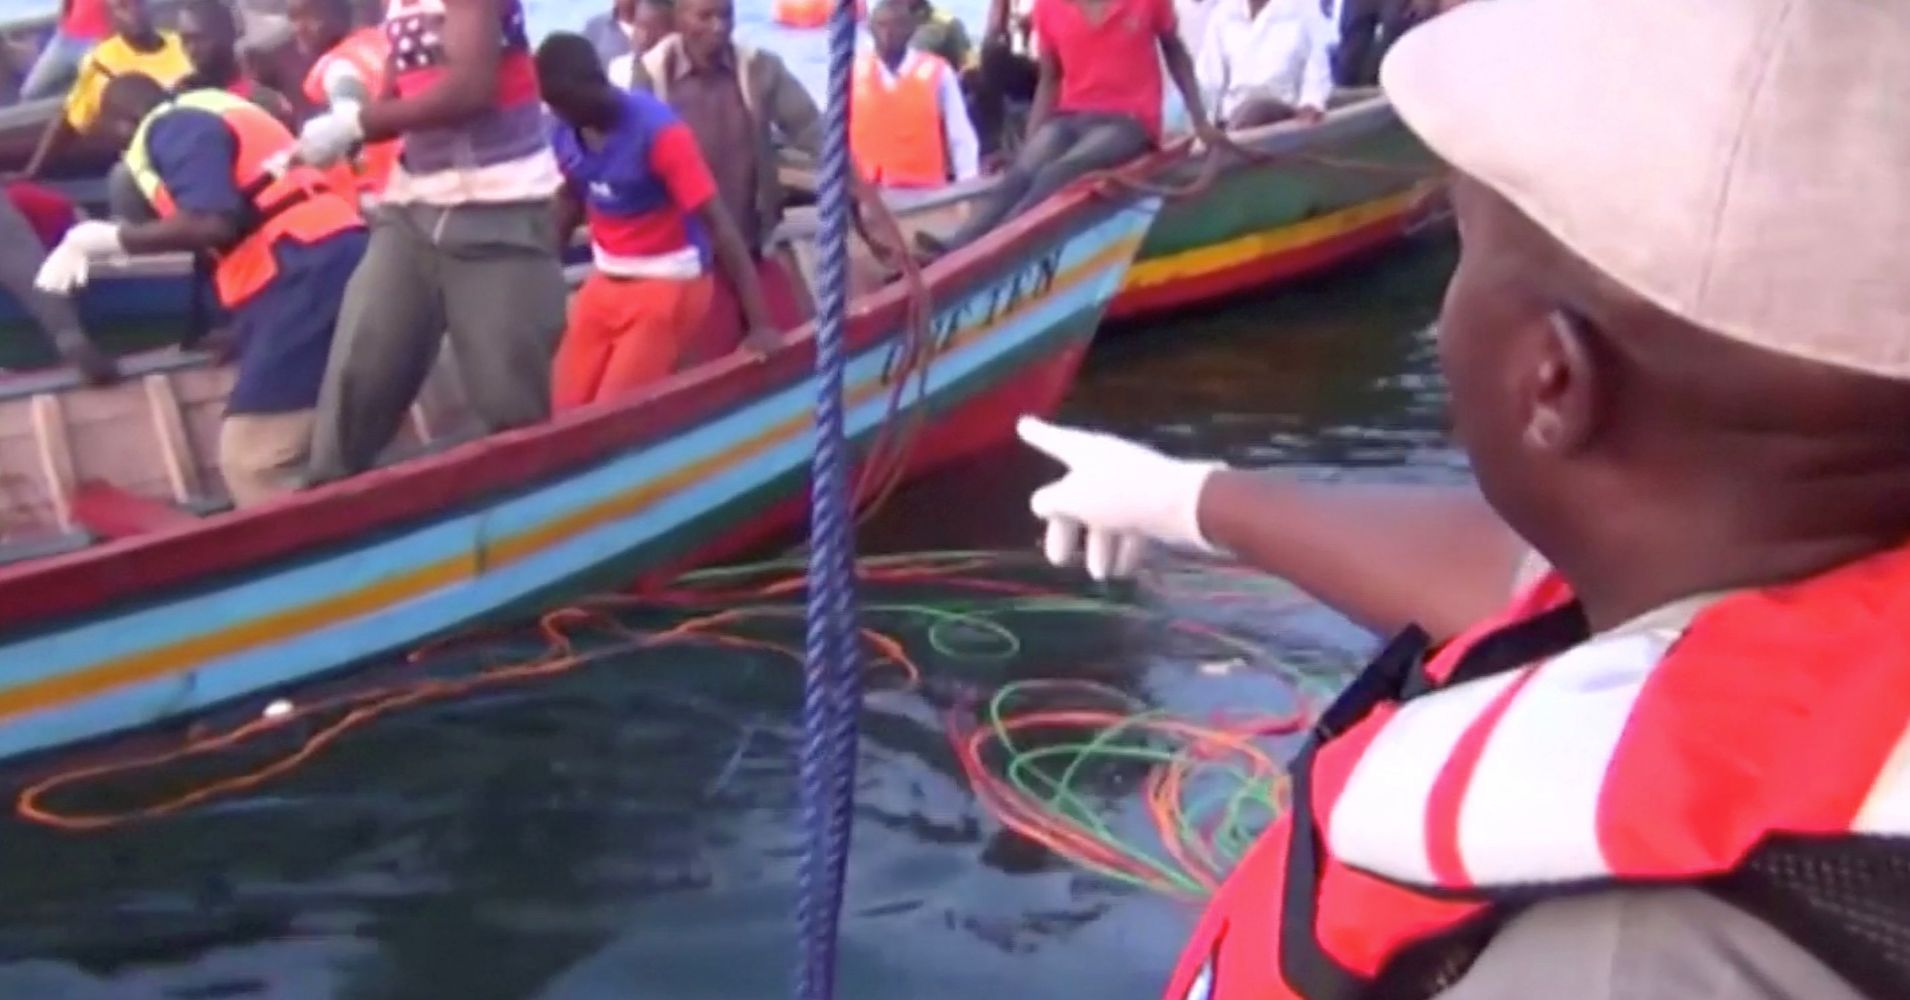 Death Toll From Tanzania Ferry Sinking Tops 100, B...